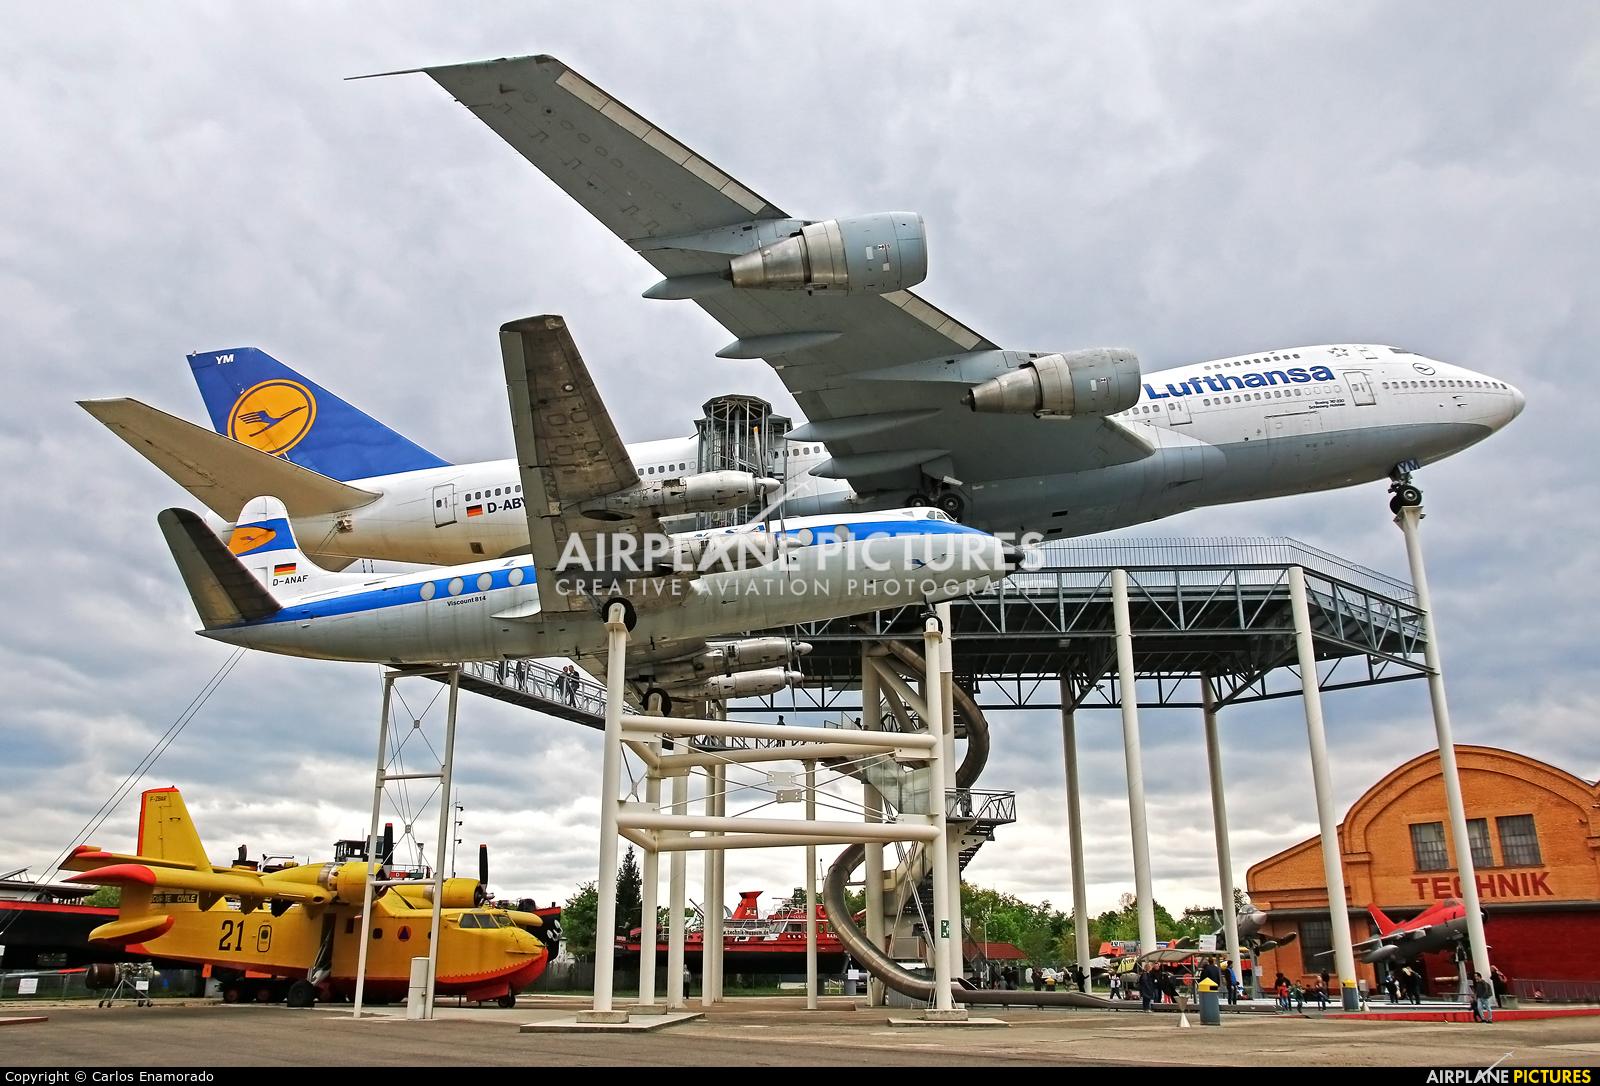 Lufthansa D-ANAF aircraft at Speyer Airport